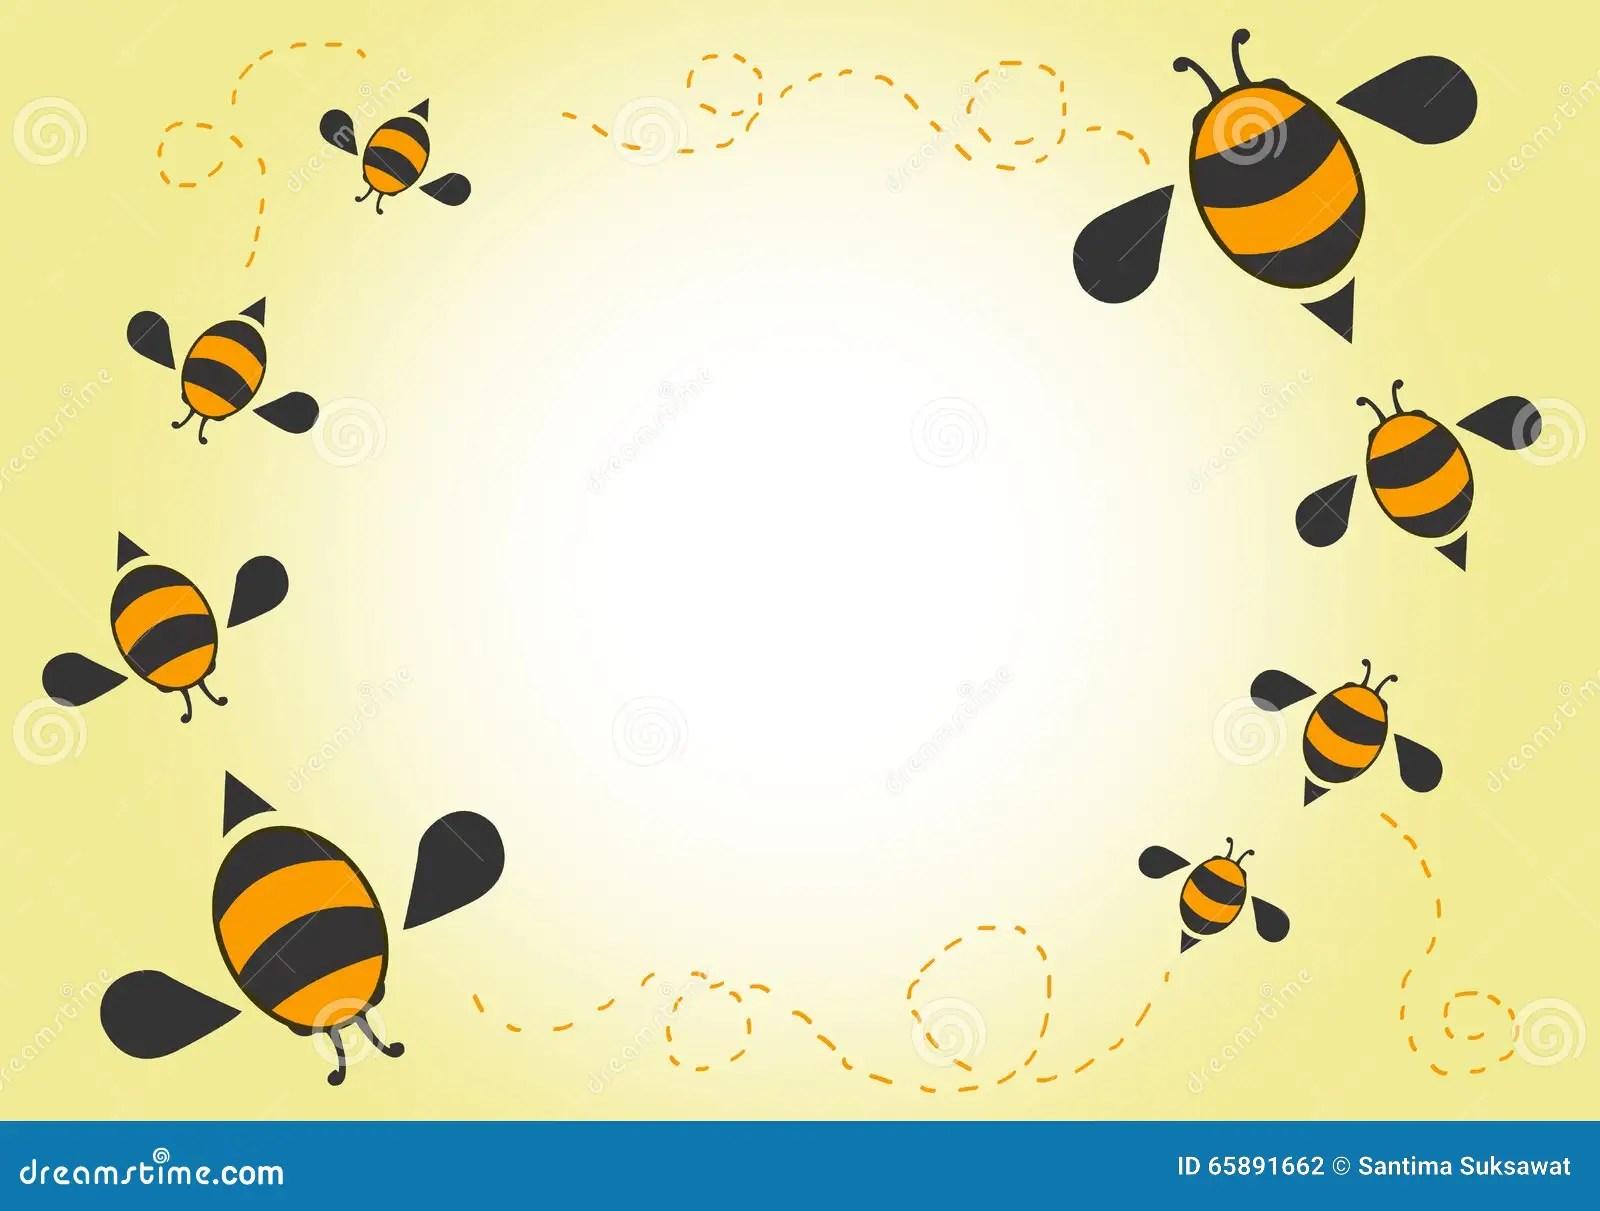 Bees Cartoon Background Stock Vector Image Of Ladybug